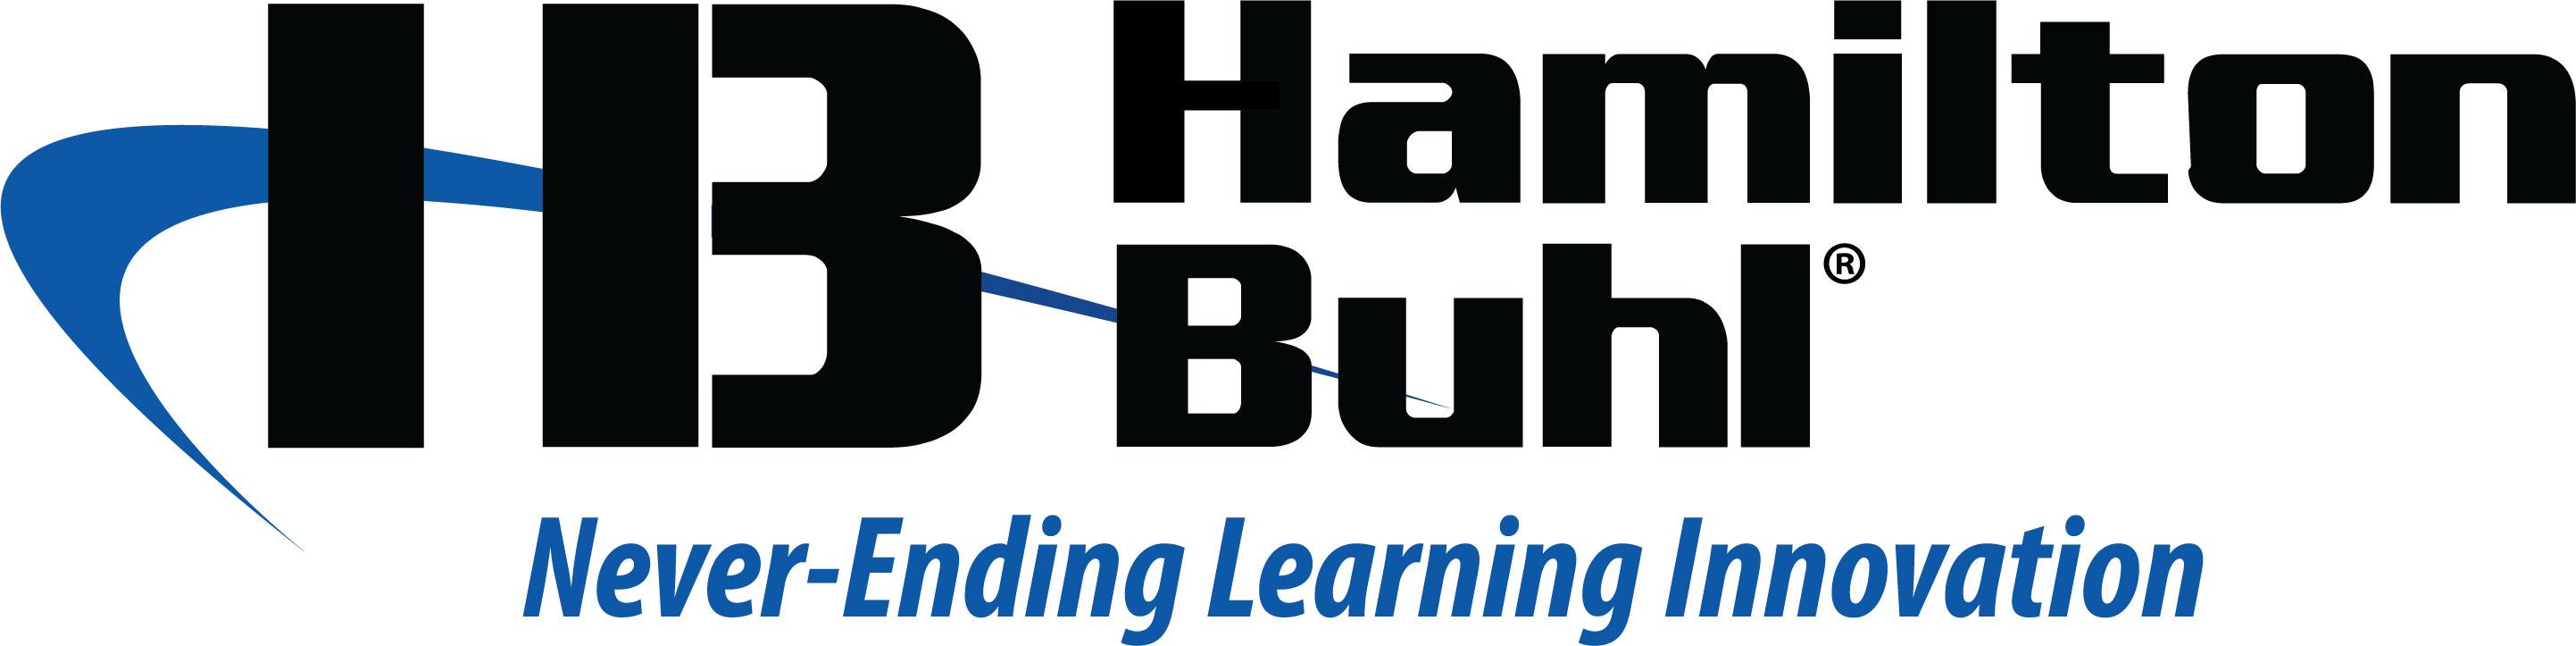 The September 2018 Digital Edition of <em>Educational Leadership</em> is sponsored by HamiltonBuhl.